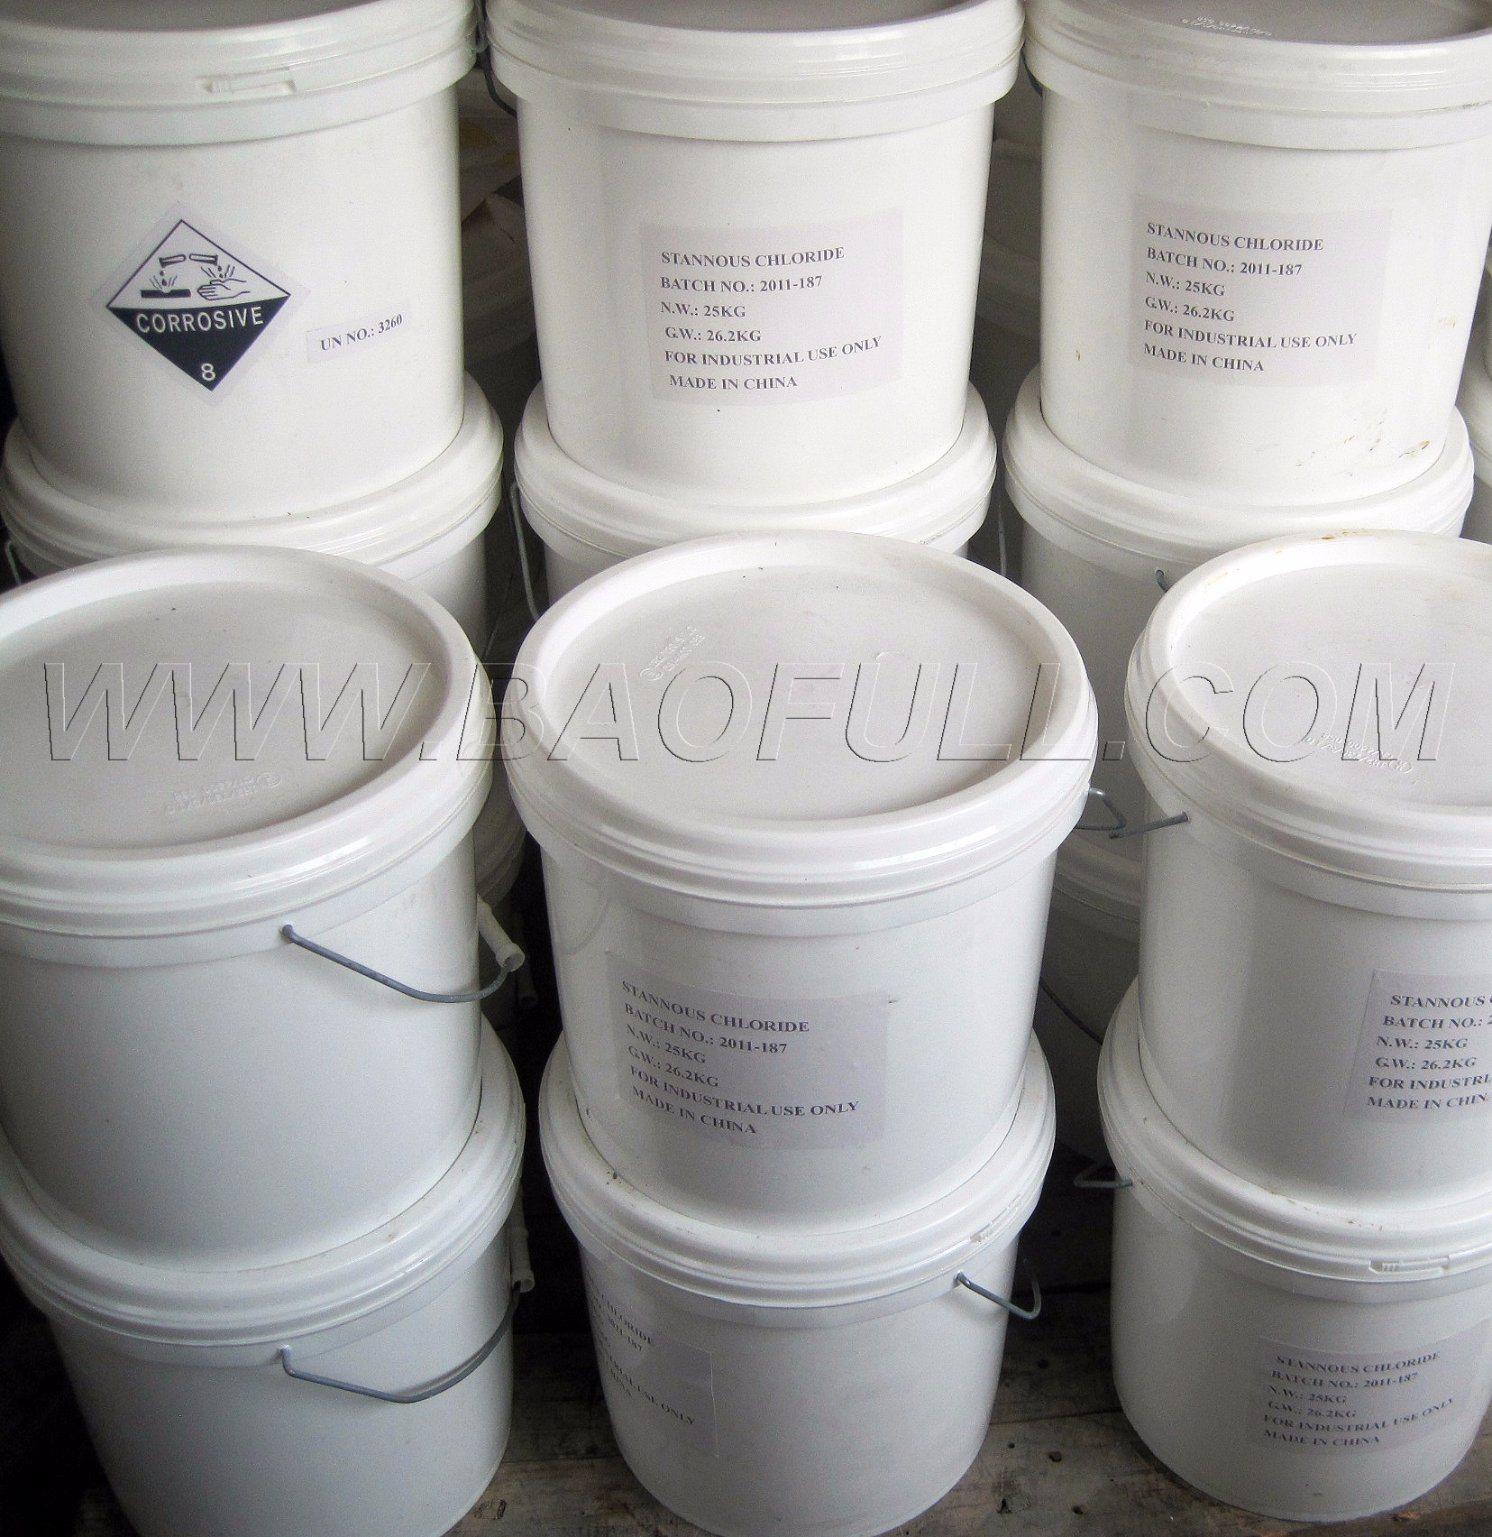 Tinc Chloride Stannous Chloride